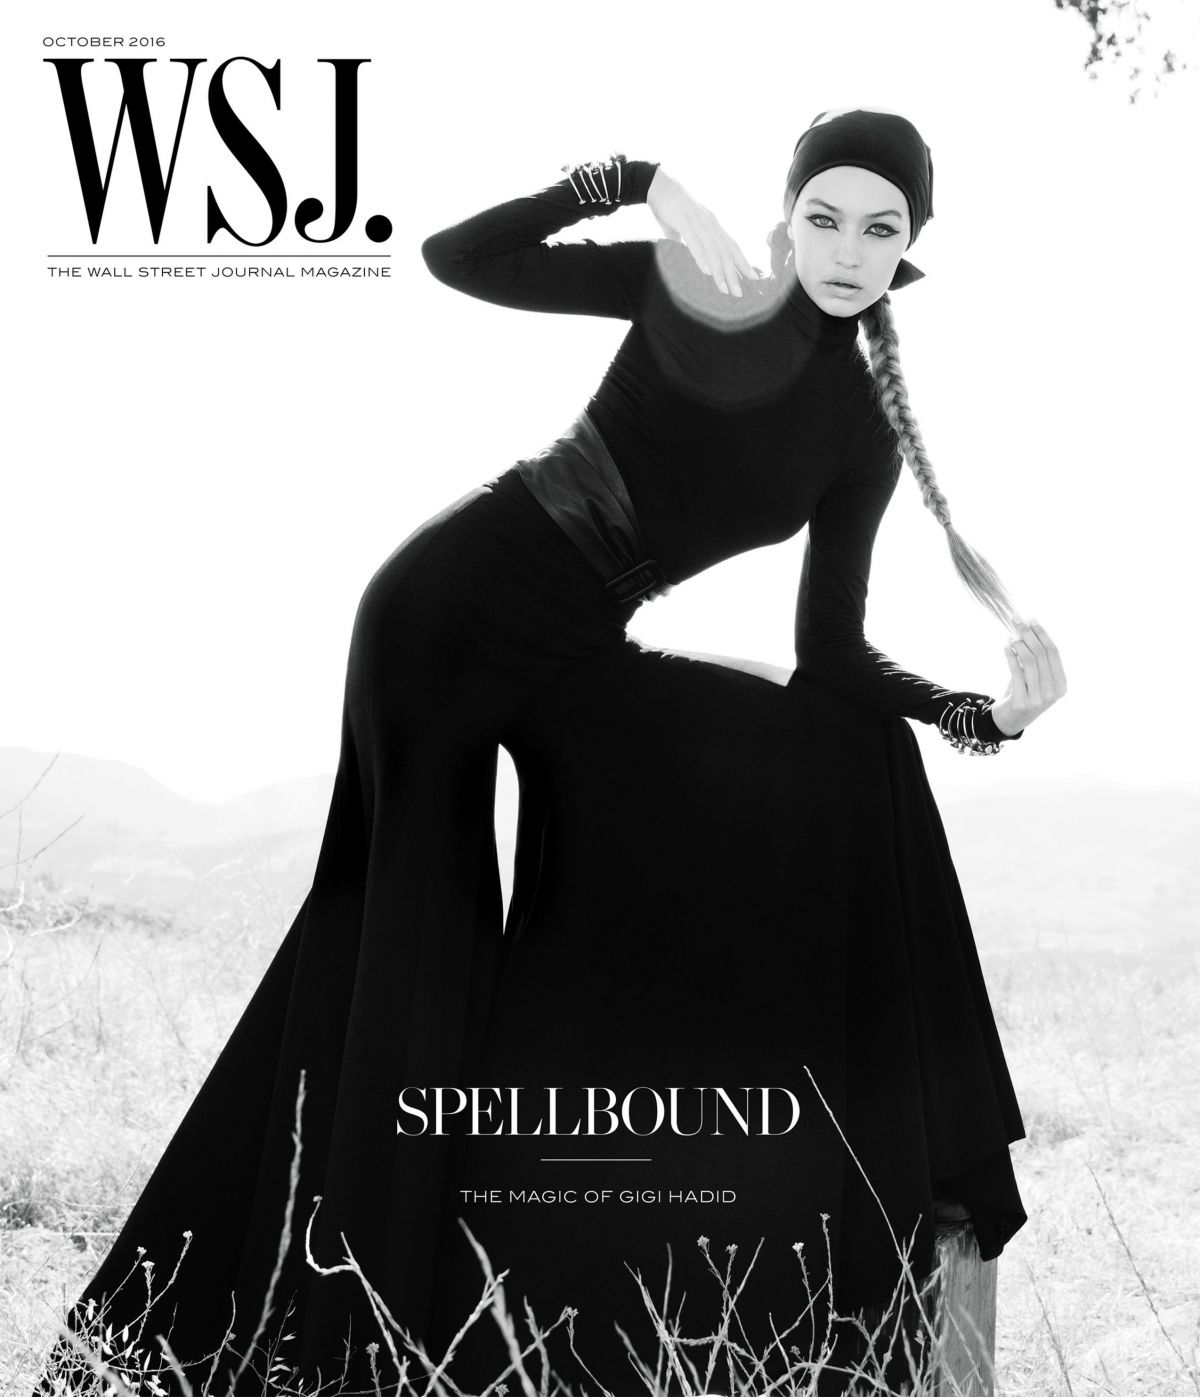 GIGI HADID for WSJ Magazine, October 2016 Issue